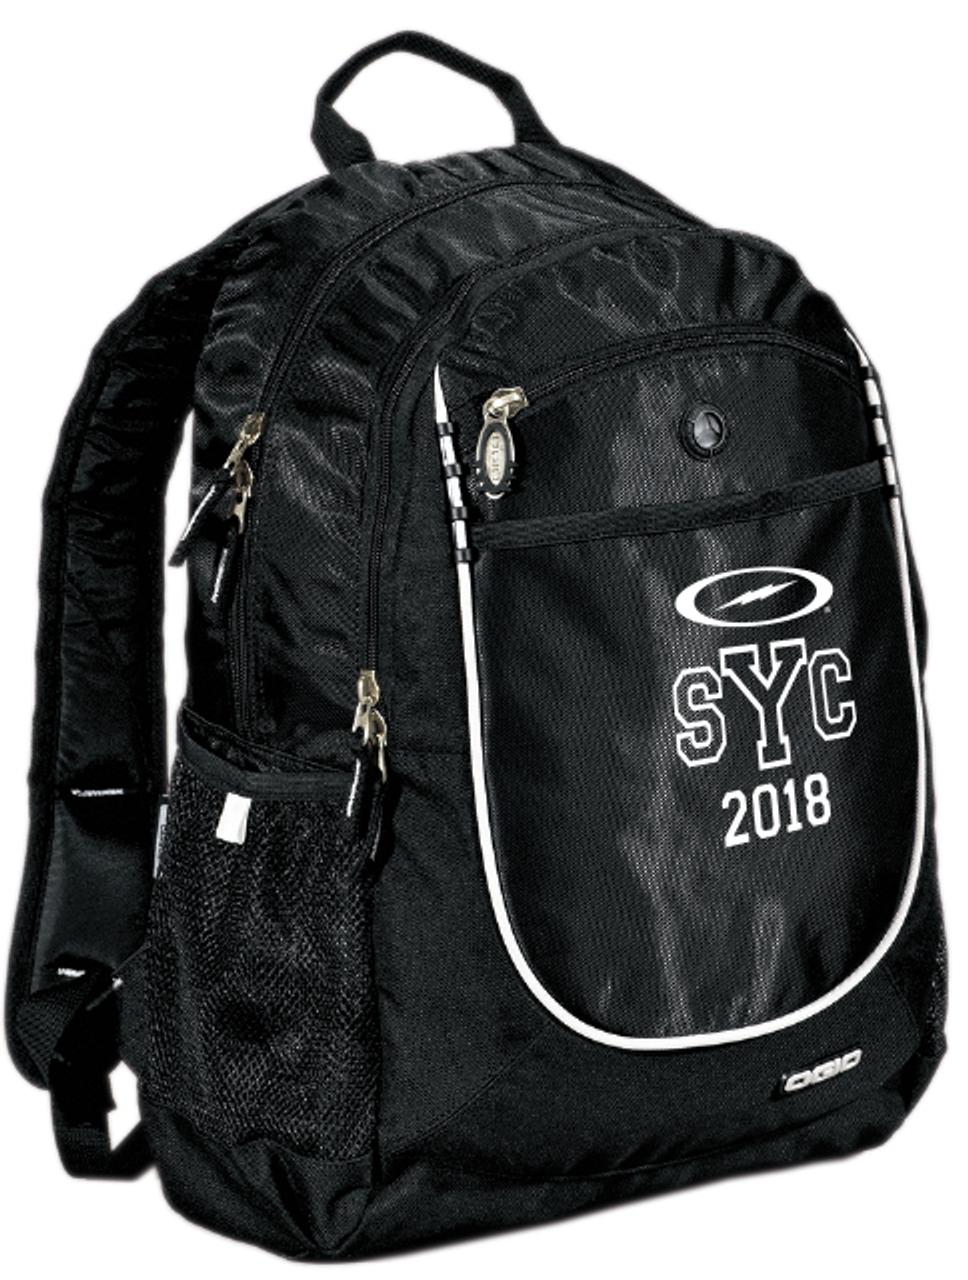 SYC Backpack - Black